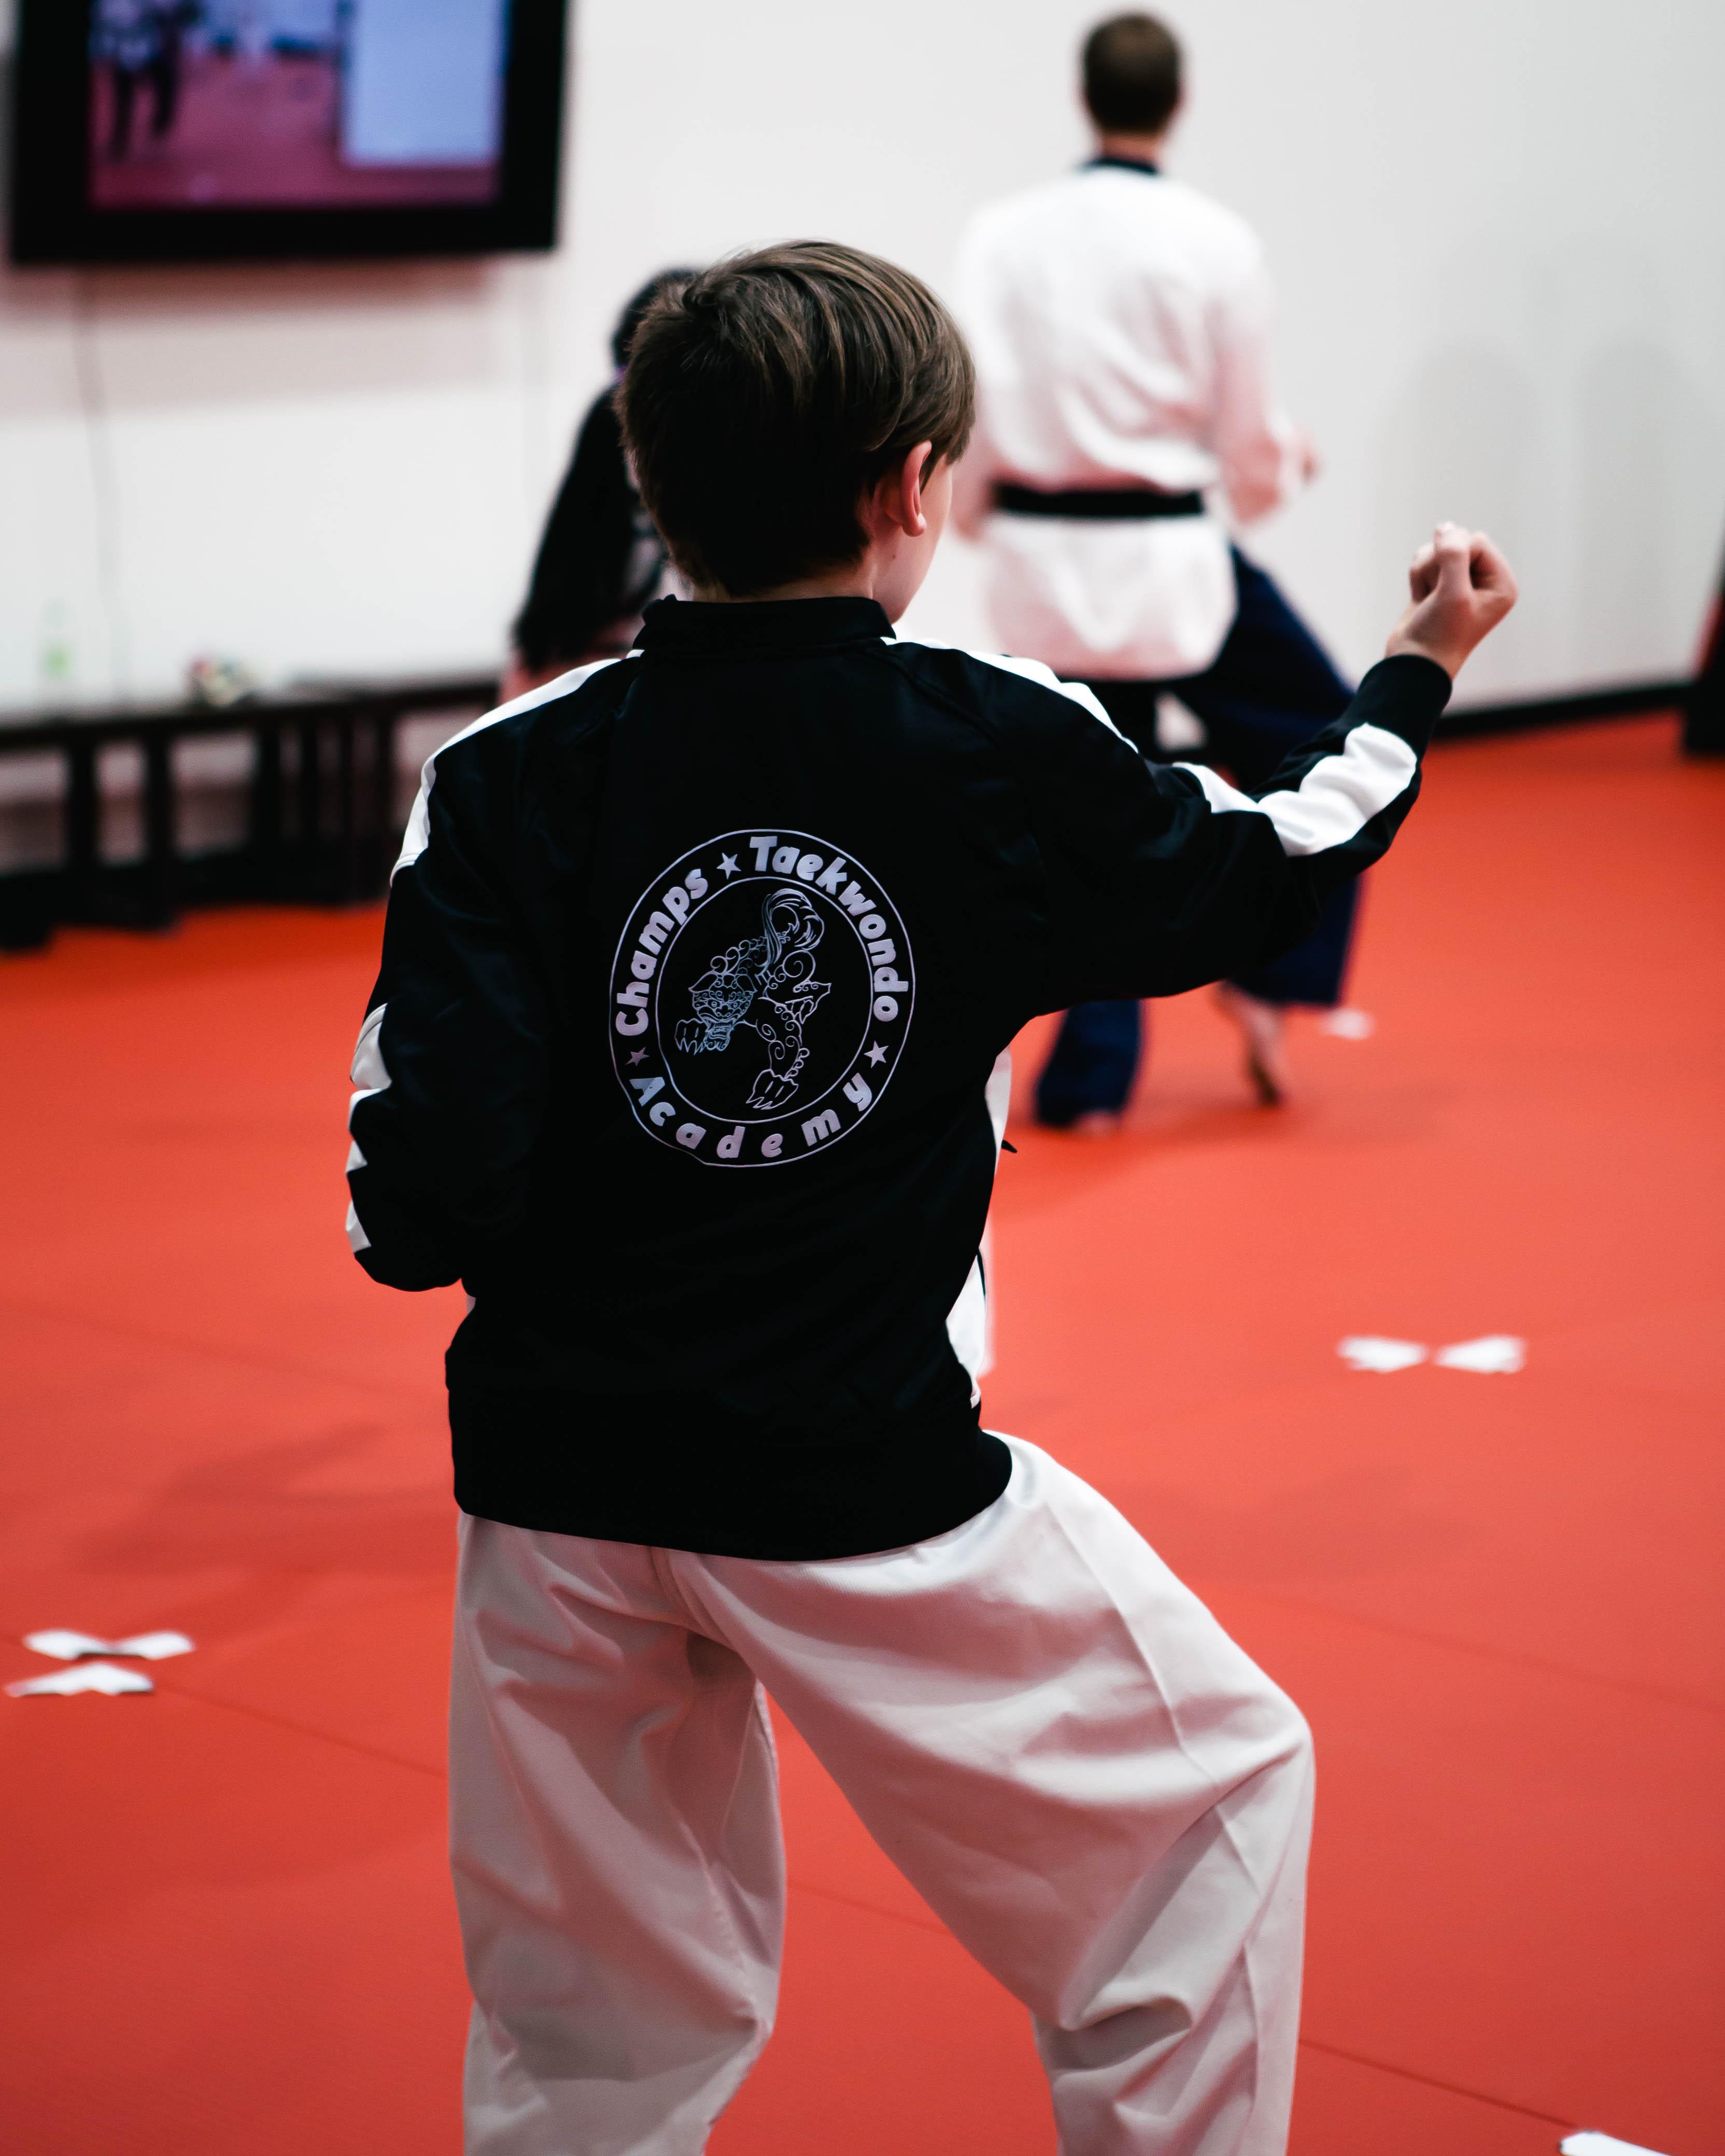 Kid learning Taekwondo